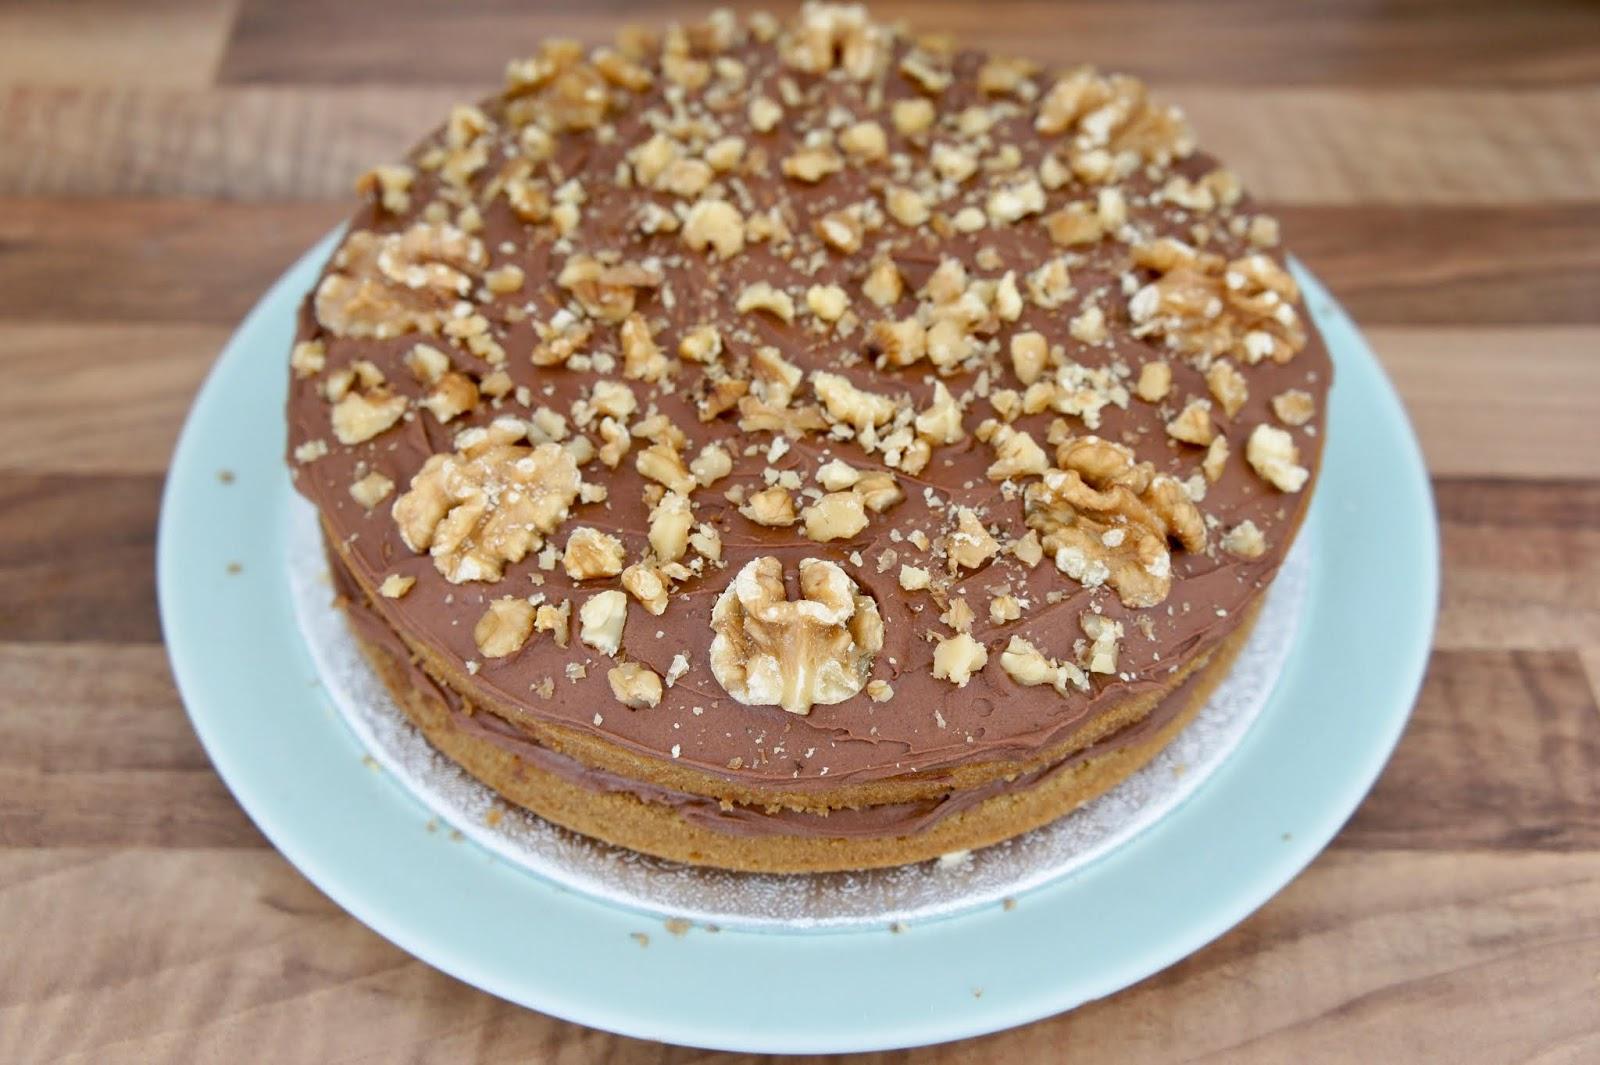 Vegan Gluten Free Mocha Walnut Cake